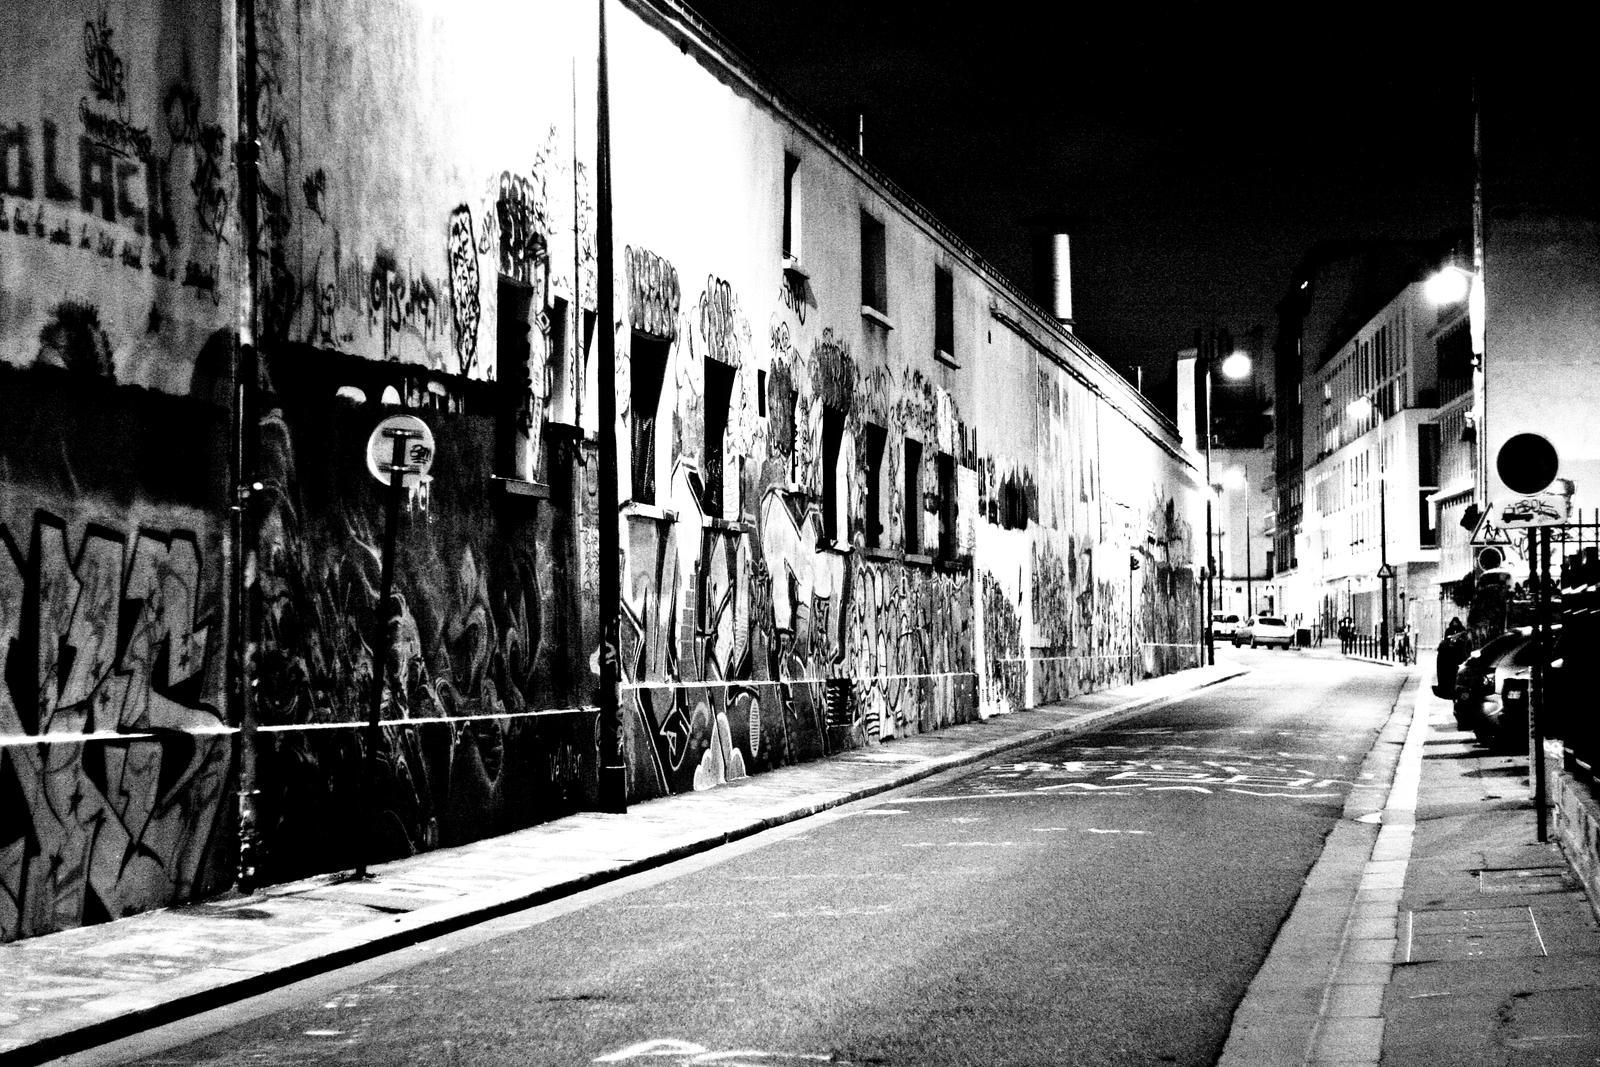 graffiti street (Paris) by tachioner on DeviantArt